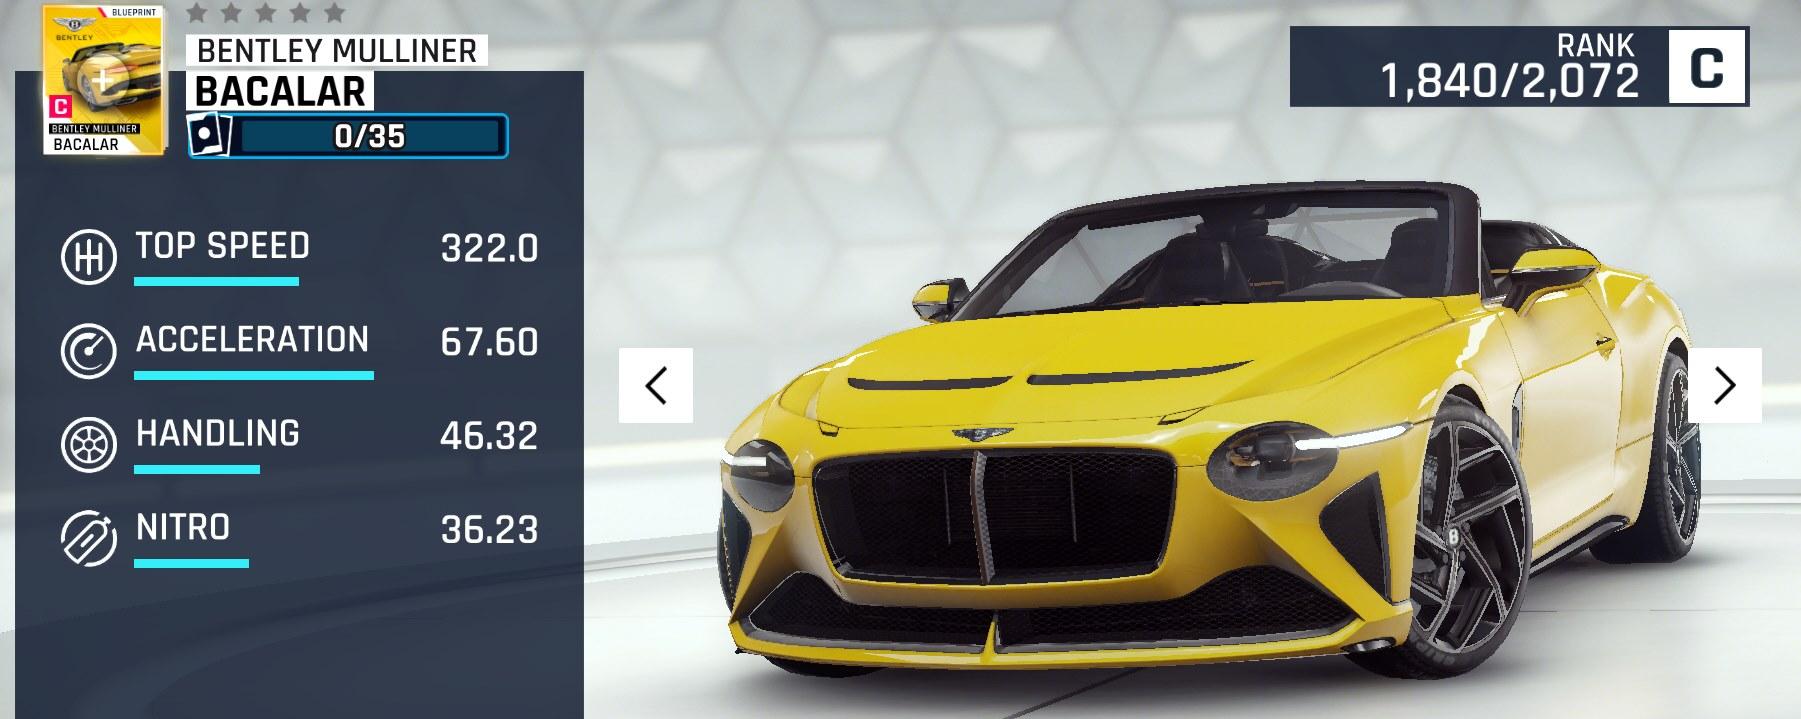 Bentley Mulliner Bacalar Asphalt Wiki Fandom